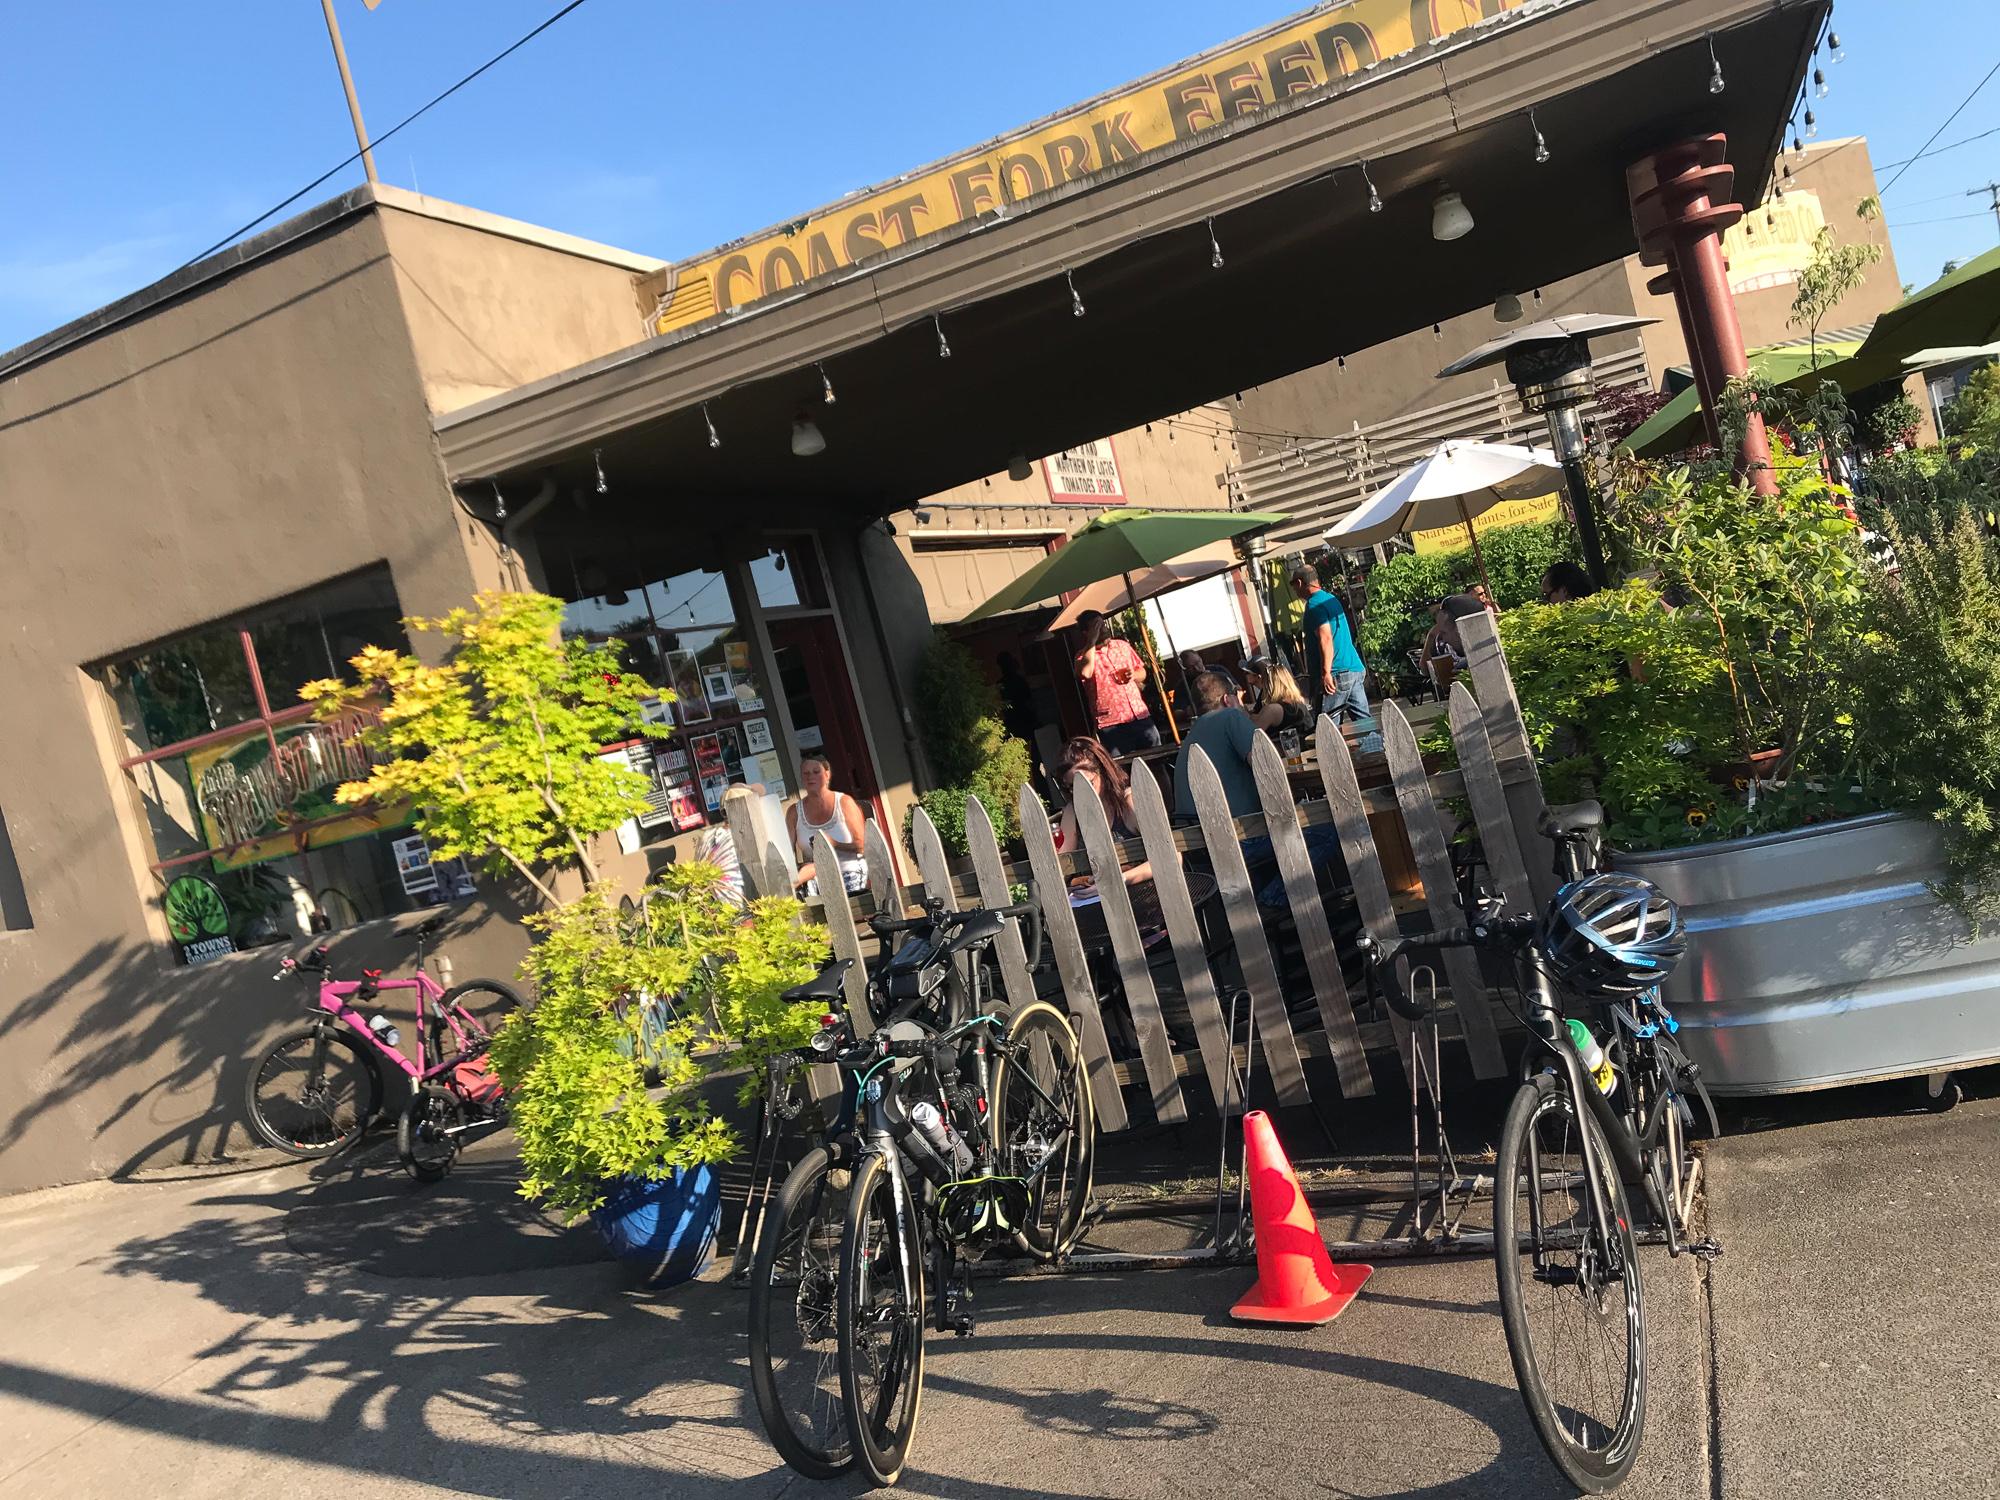 Astonishing Cottage Grove Rolls Out Welcome For Oregon Gran Fondo Bikeportland Org Interior Design Ideas Gentotryabchikinfo